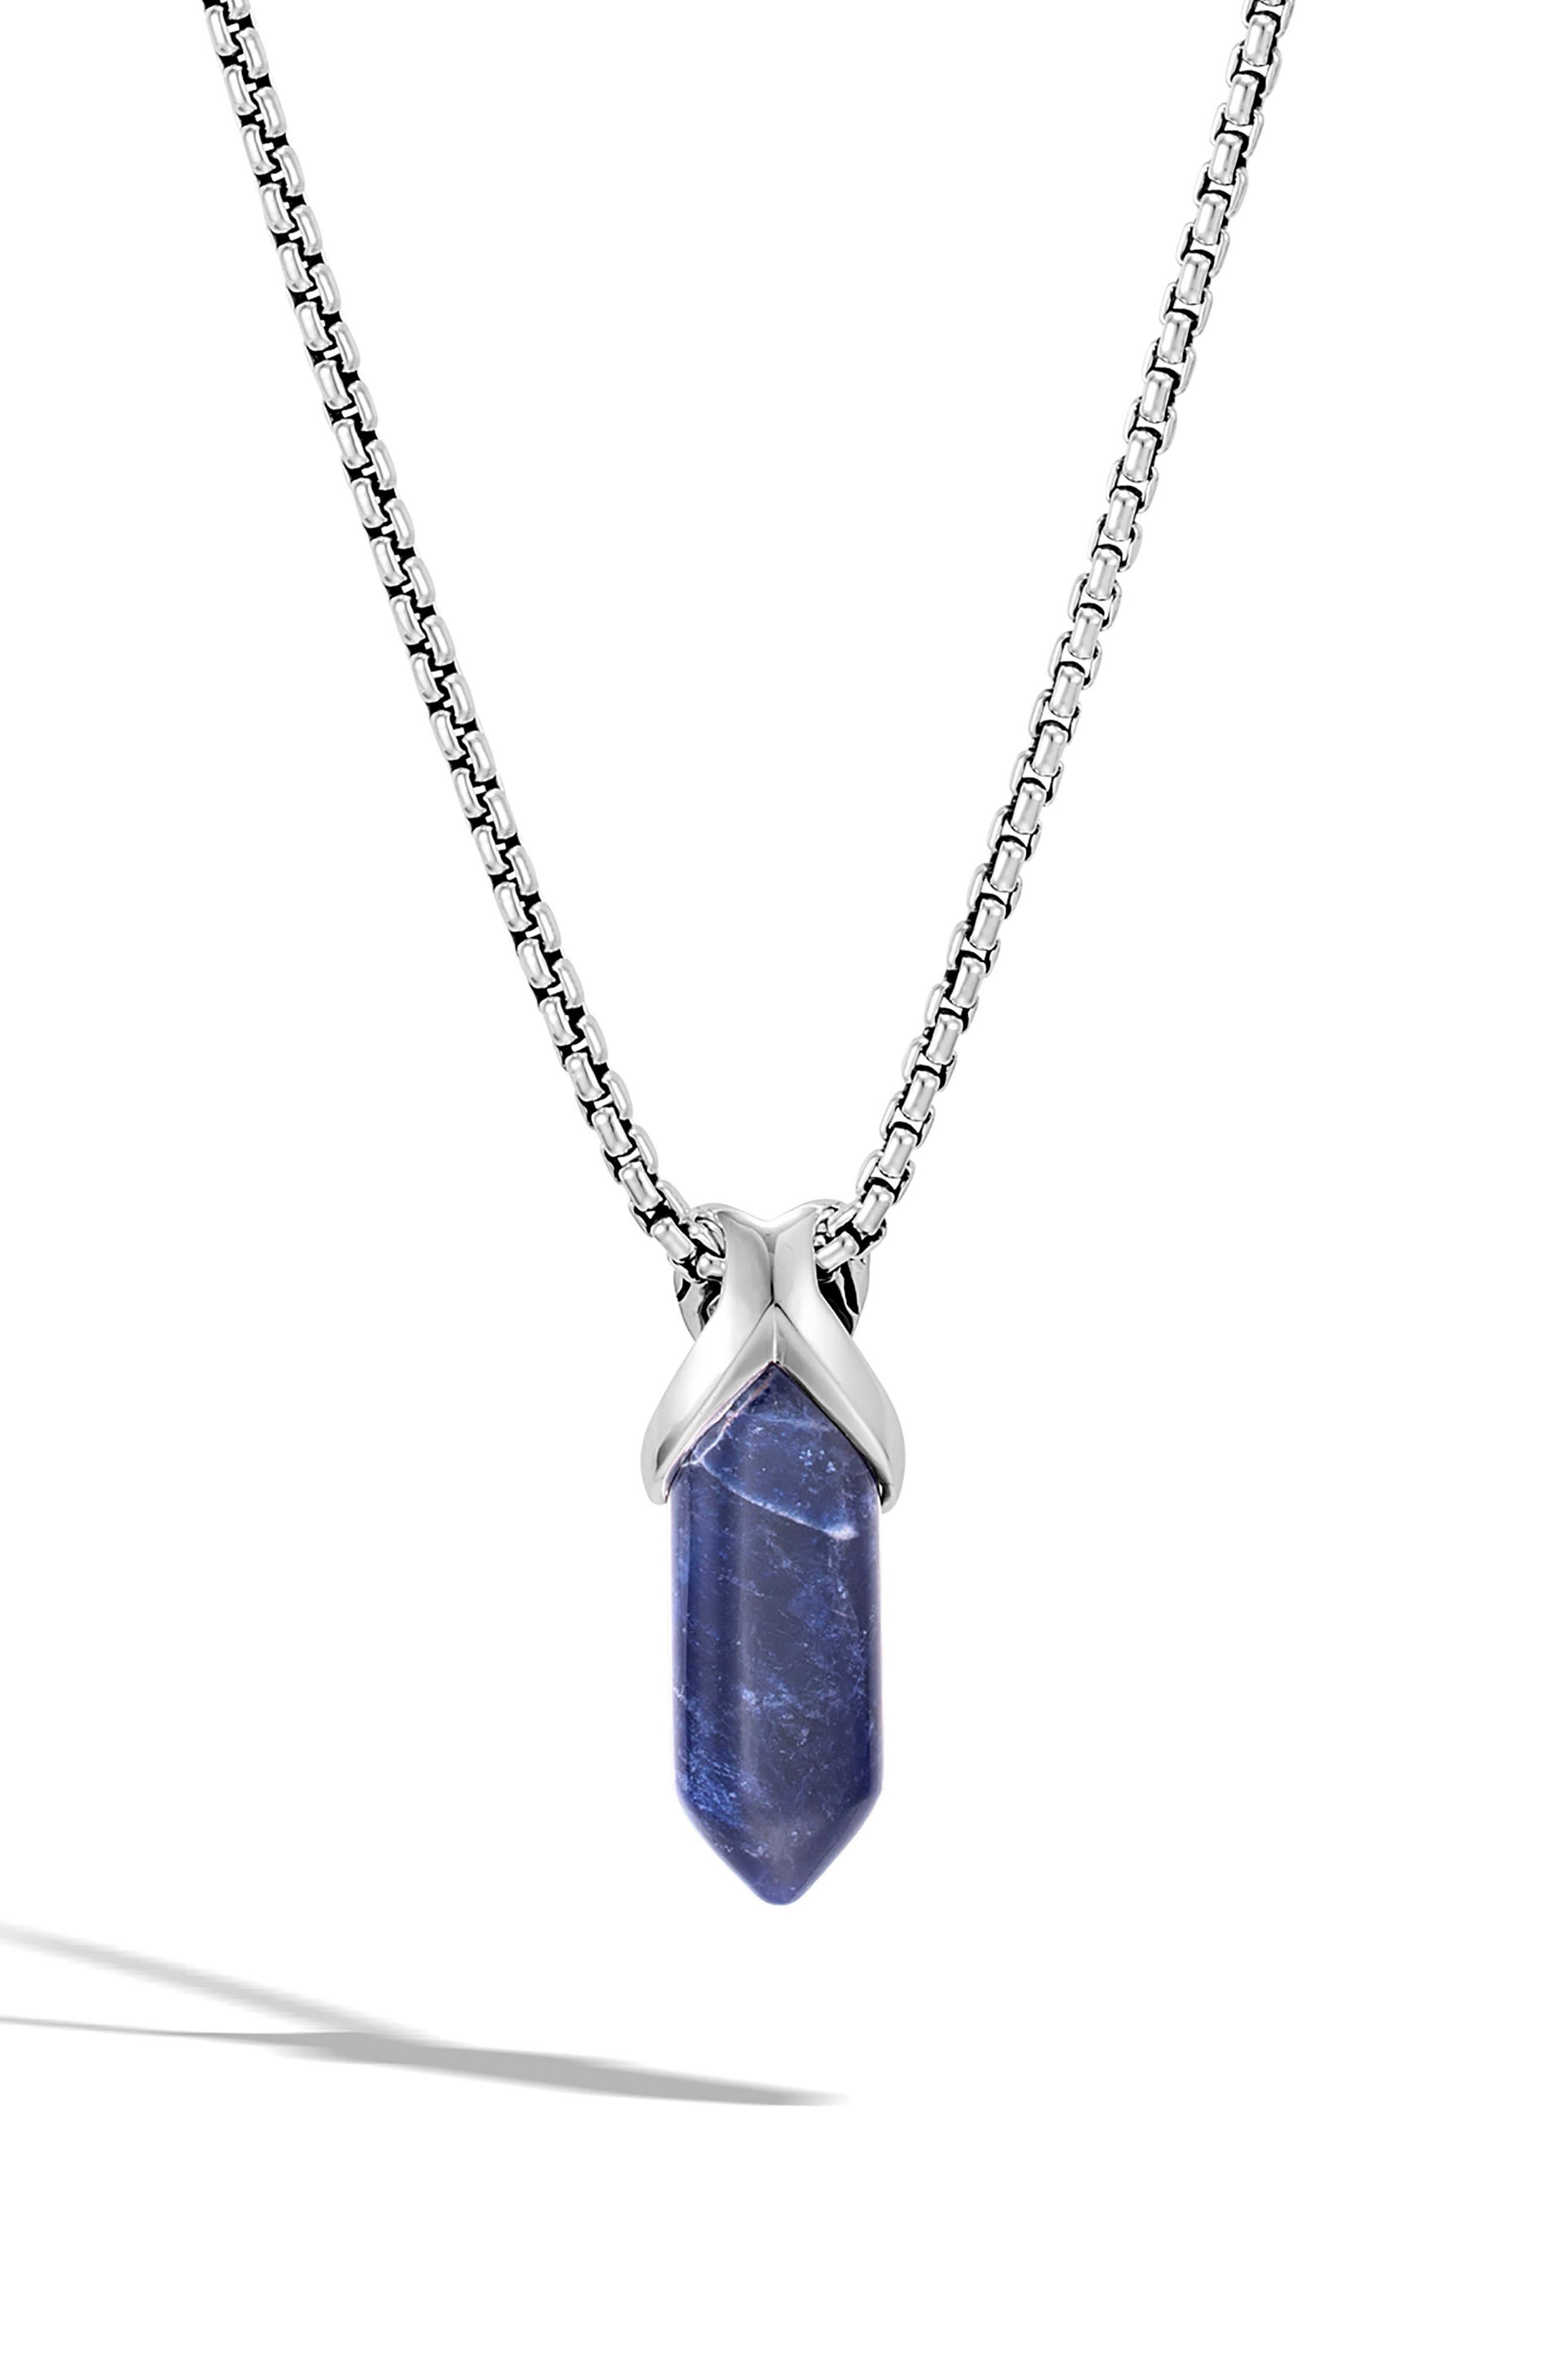 Men's Asli Classic Chain Reversible Pendant Necklace,                         Main,                         color, SILVER/ SODALITE